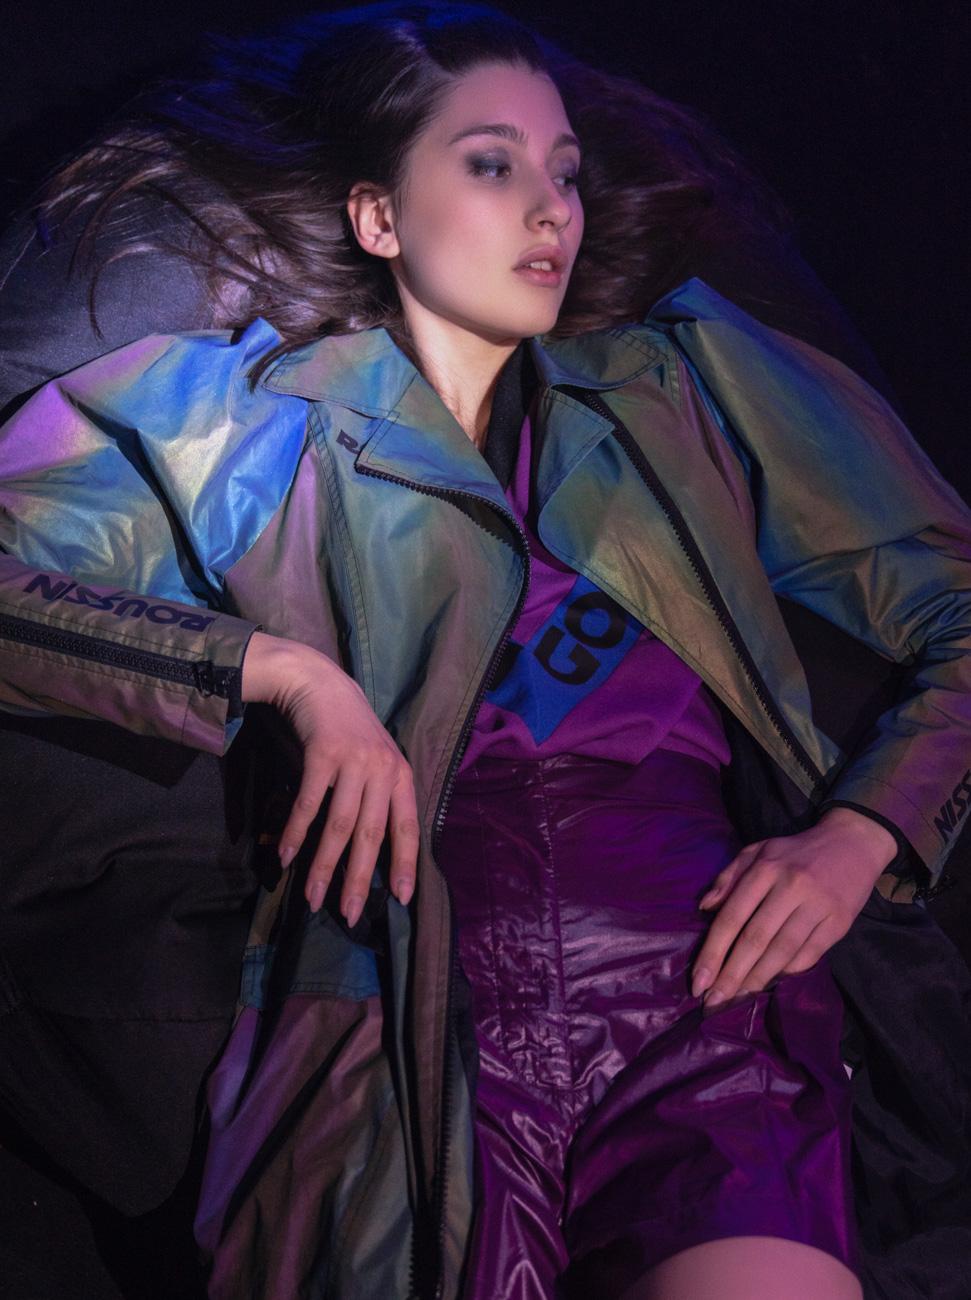 Trench coat- ROUSSIN Design Studio, Pullover- ROUSSIN Design Studio, Shorts- Savchenko